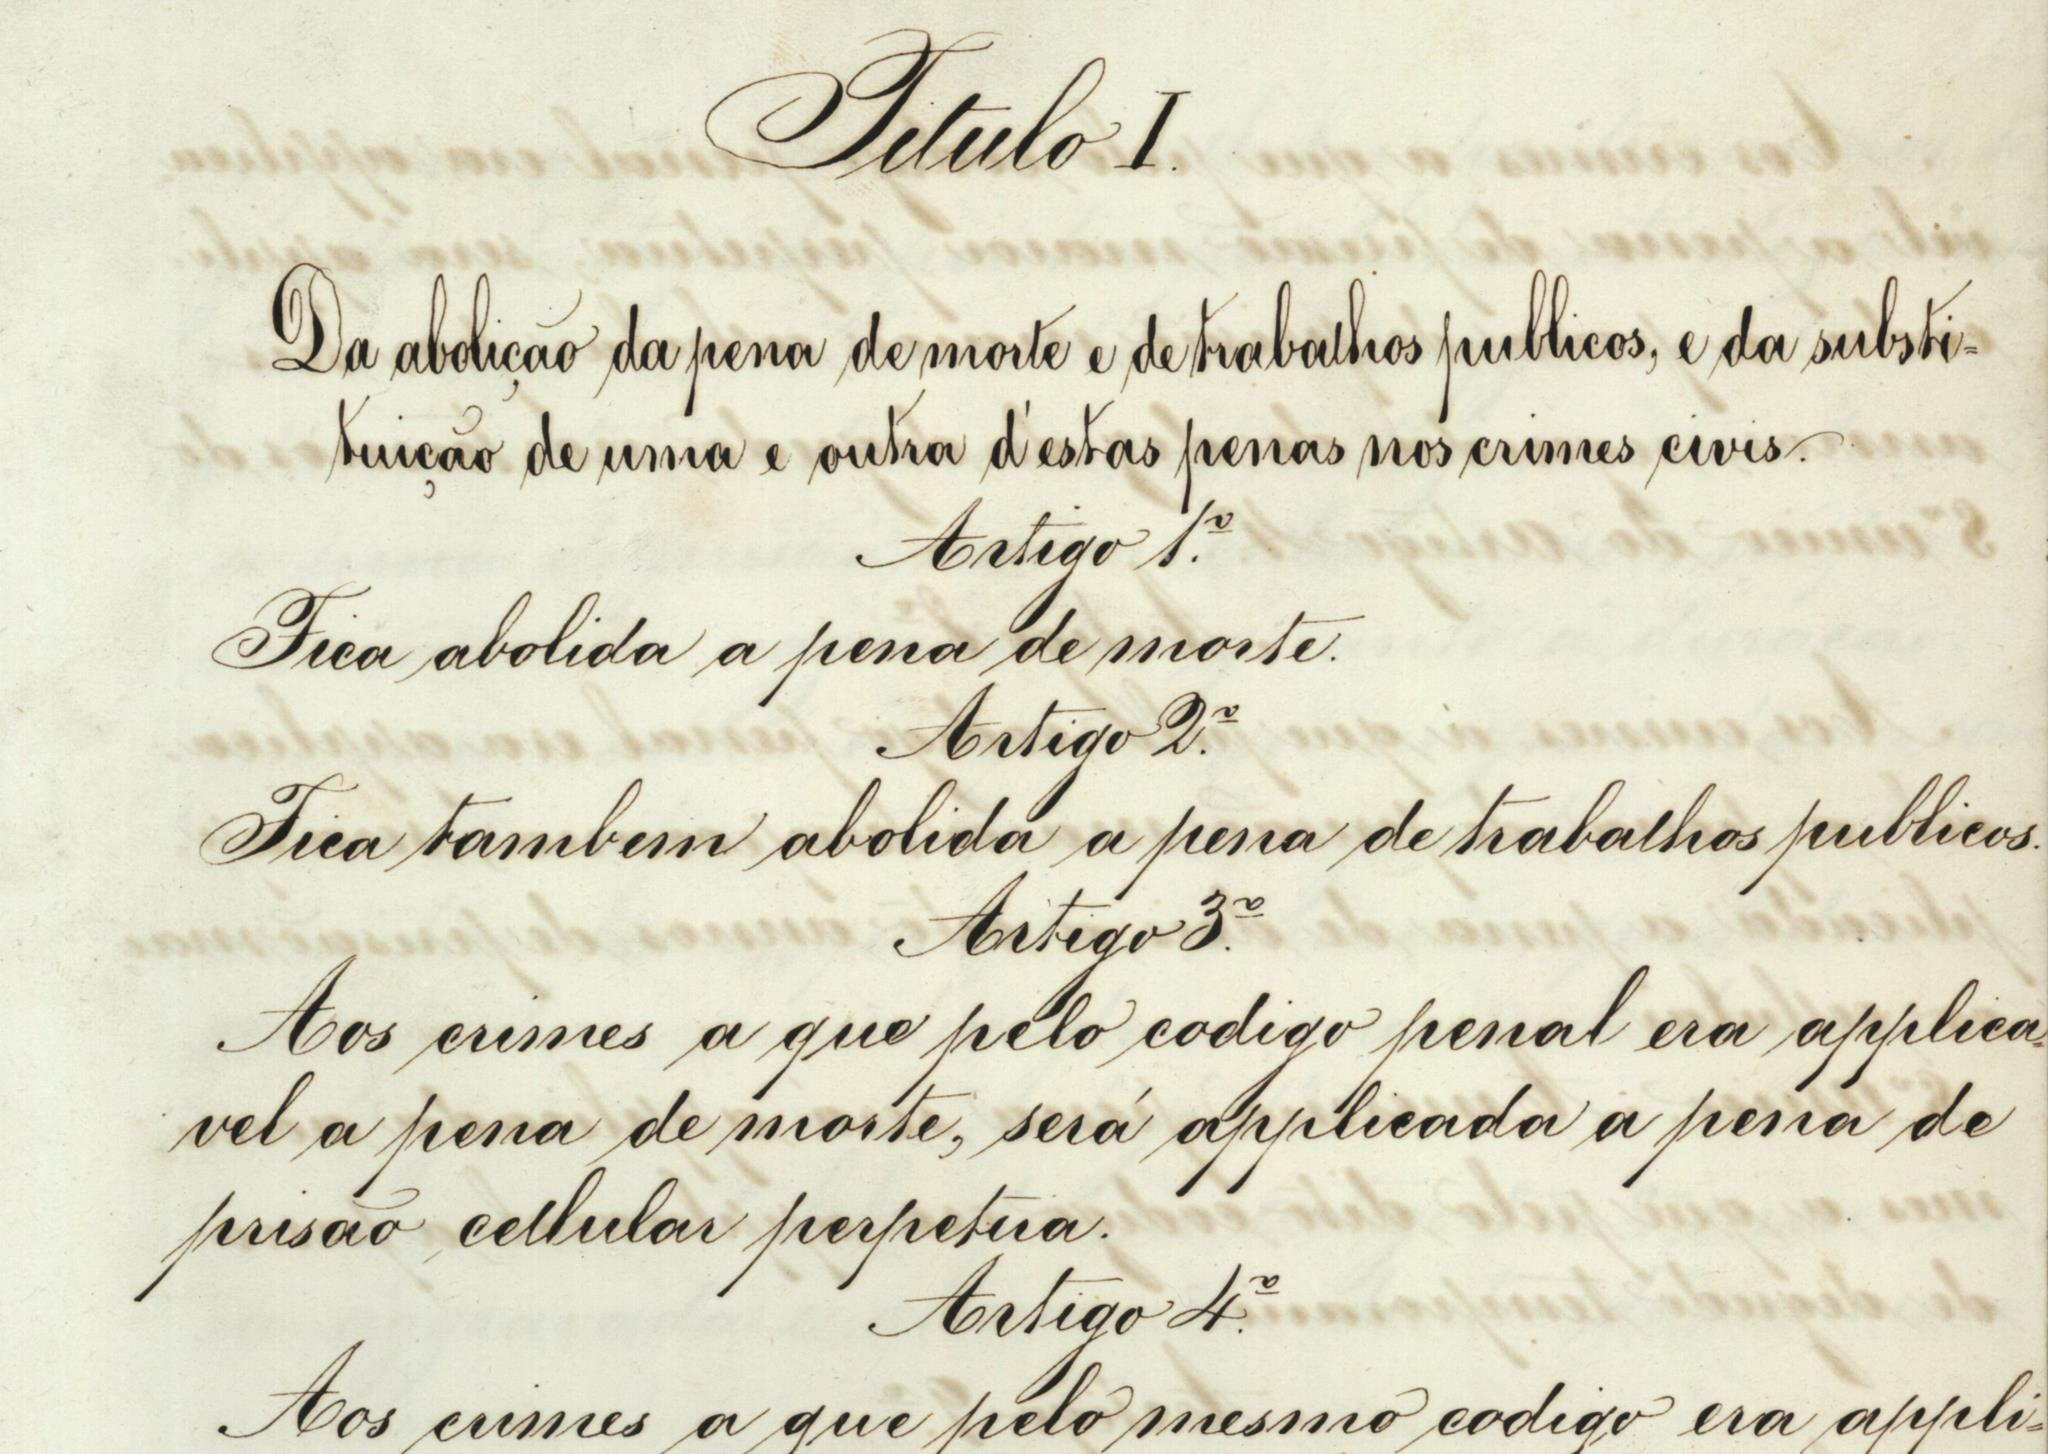 Há 150 anos, Portugal dava o exemplo que a Europa iria imitar